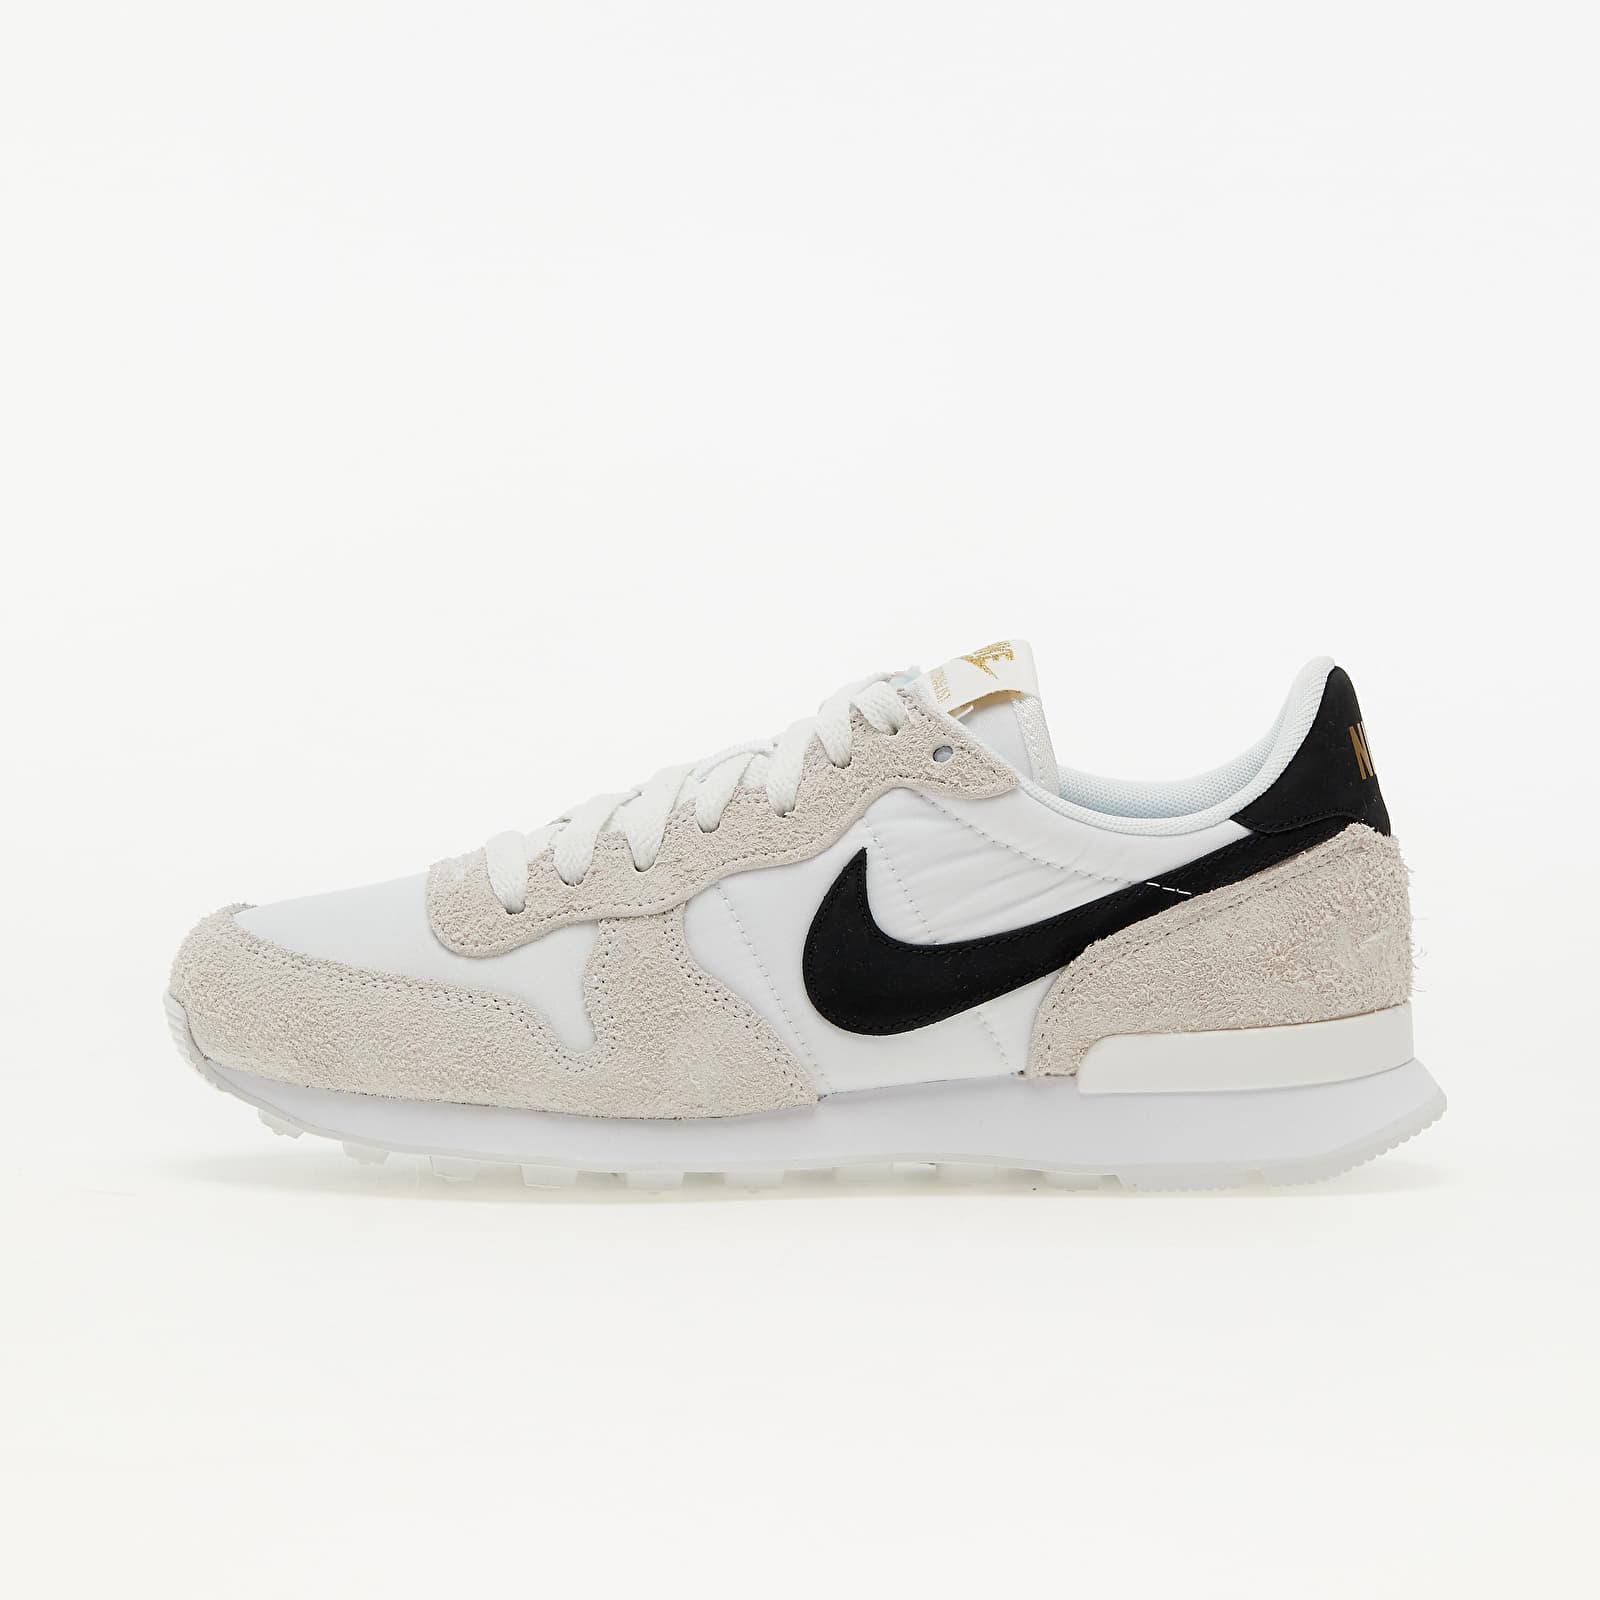 Nike W Internationalist Summit White/ Black-Metallic Gold-White 828407-108